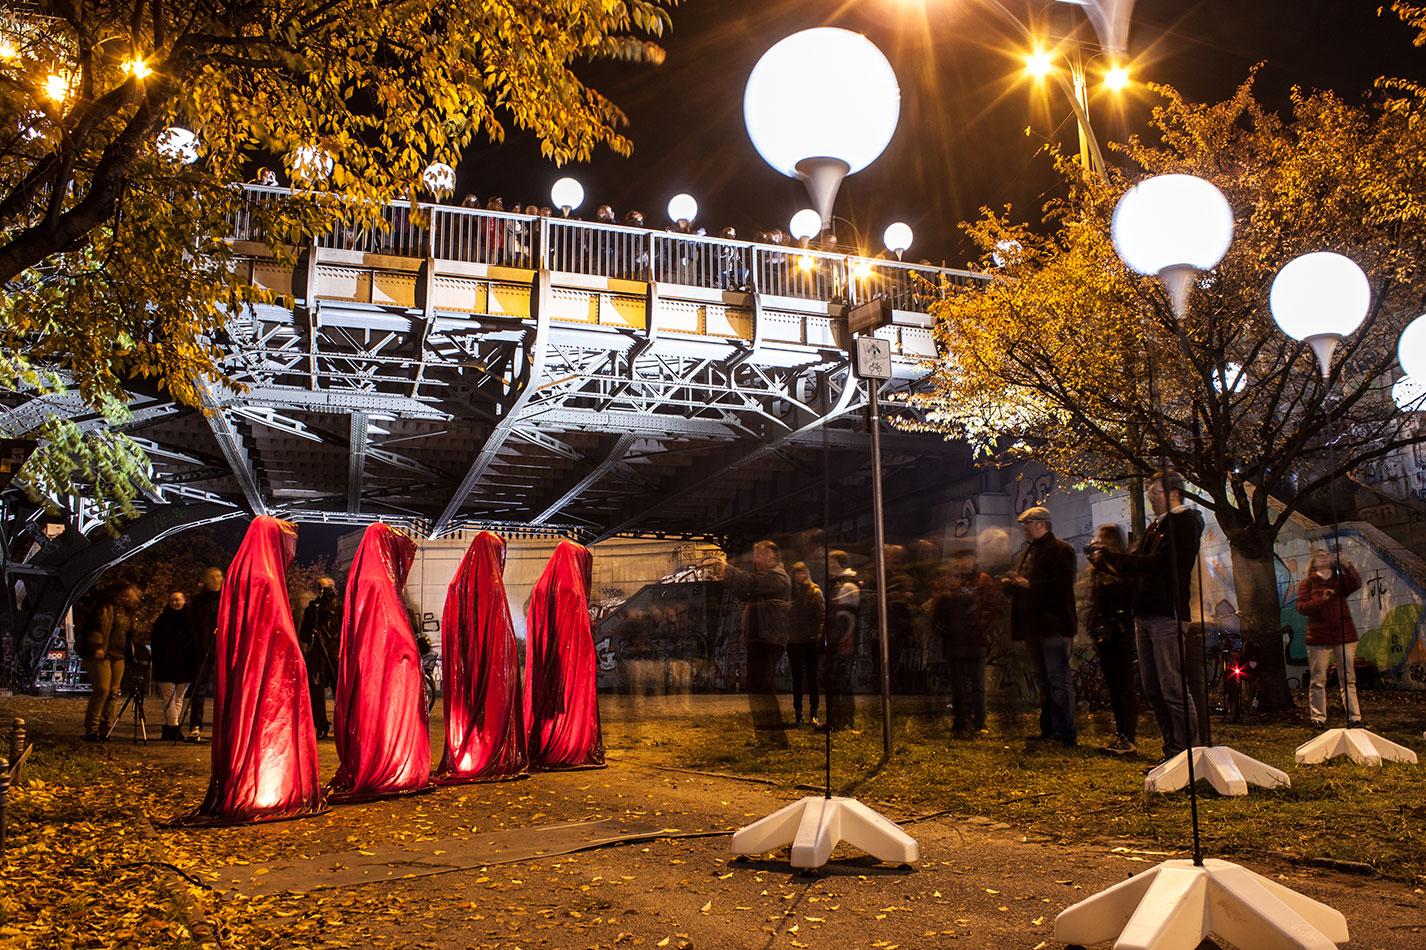 25-jears-wallfall-berlin-germany-contemporary-fine-art-show-arts-design-guardians-of-time-manfred-kili-kielnhofer-4300 - Kopie